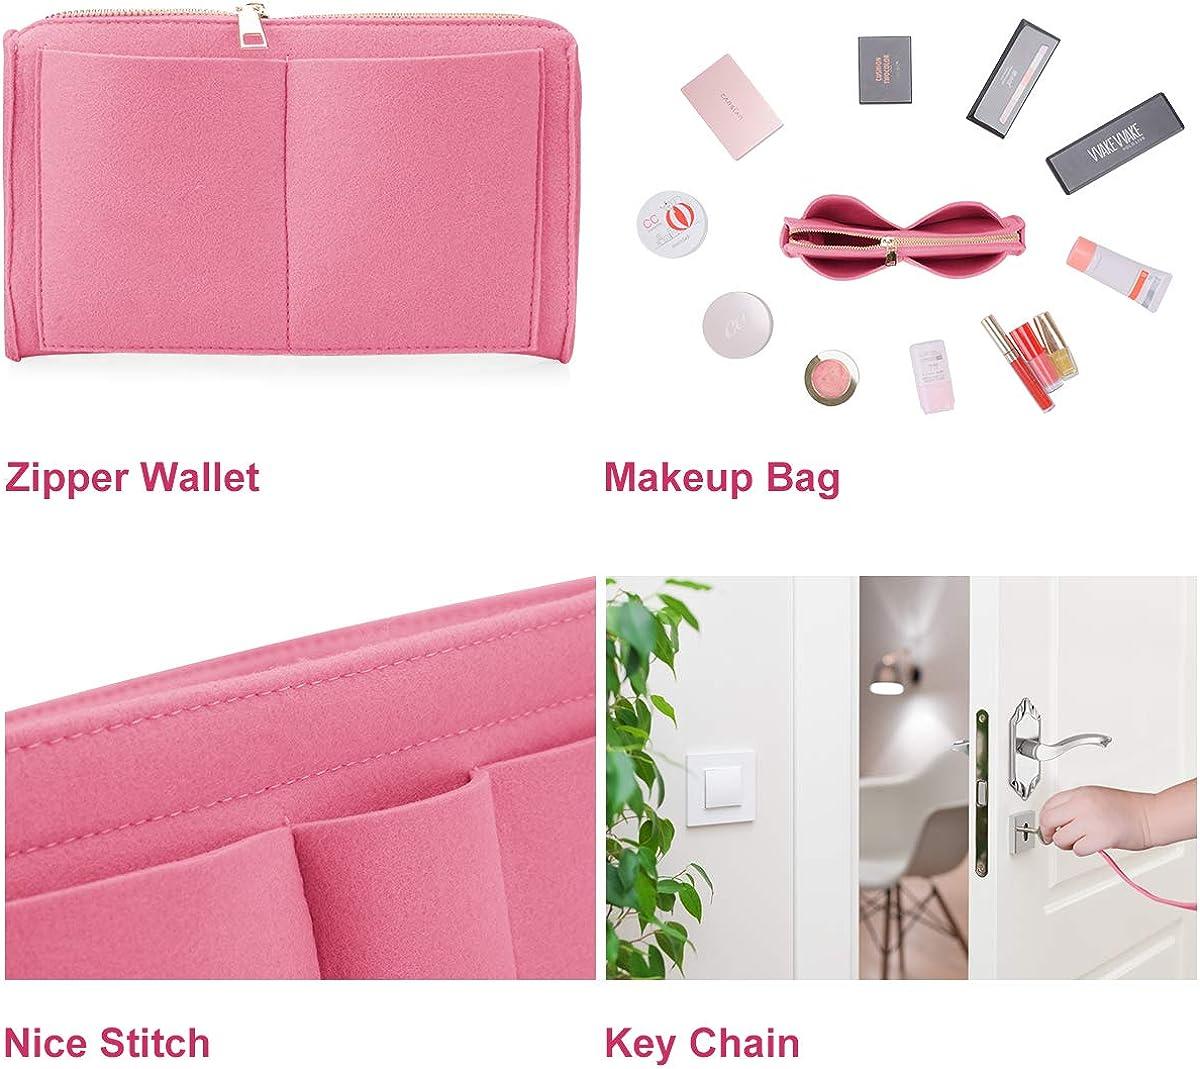 Purse Organizer Insert for Handbag Tote Felt Diaper Bag Organizer with Zipper Fits Neverfull MM Speedy 30